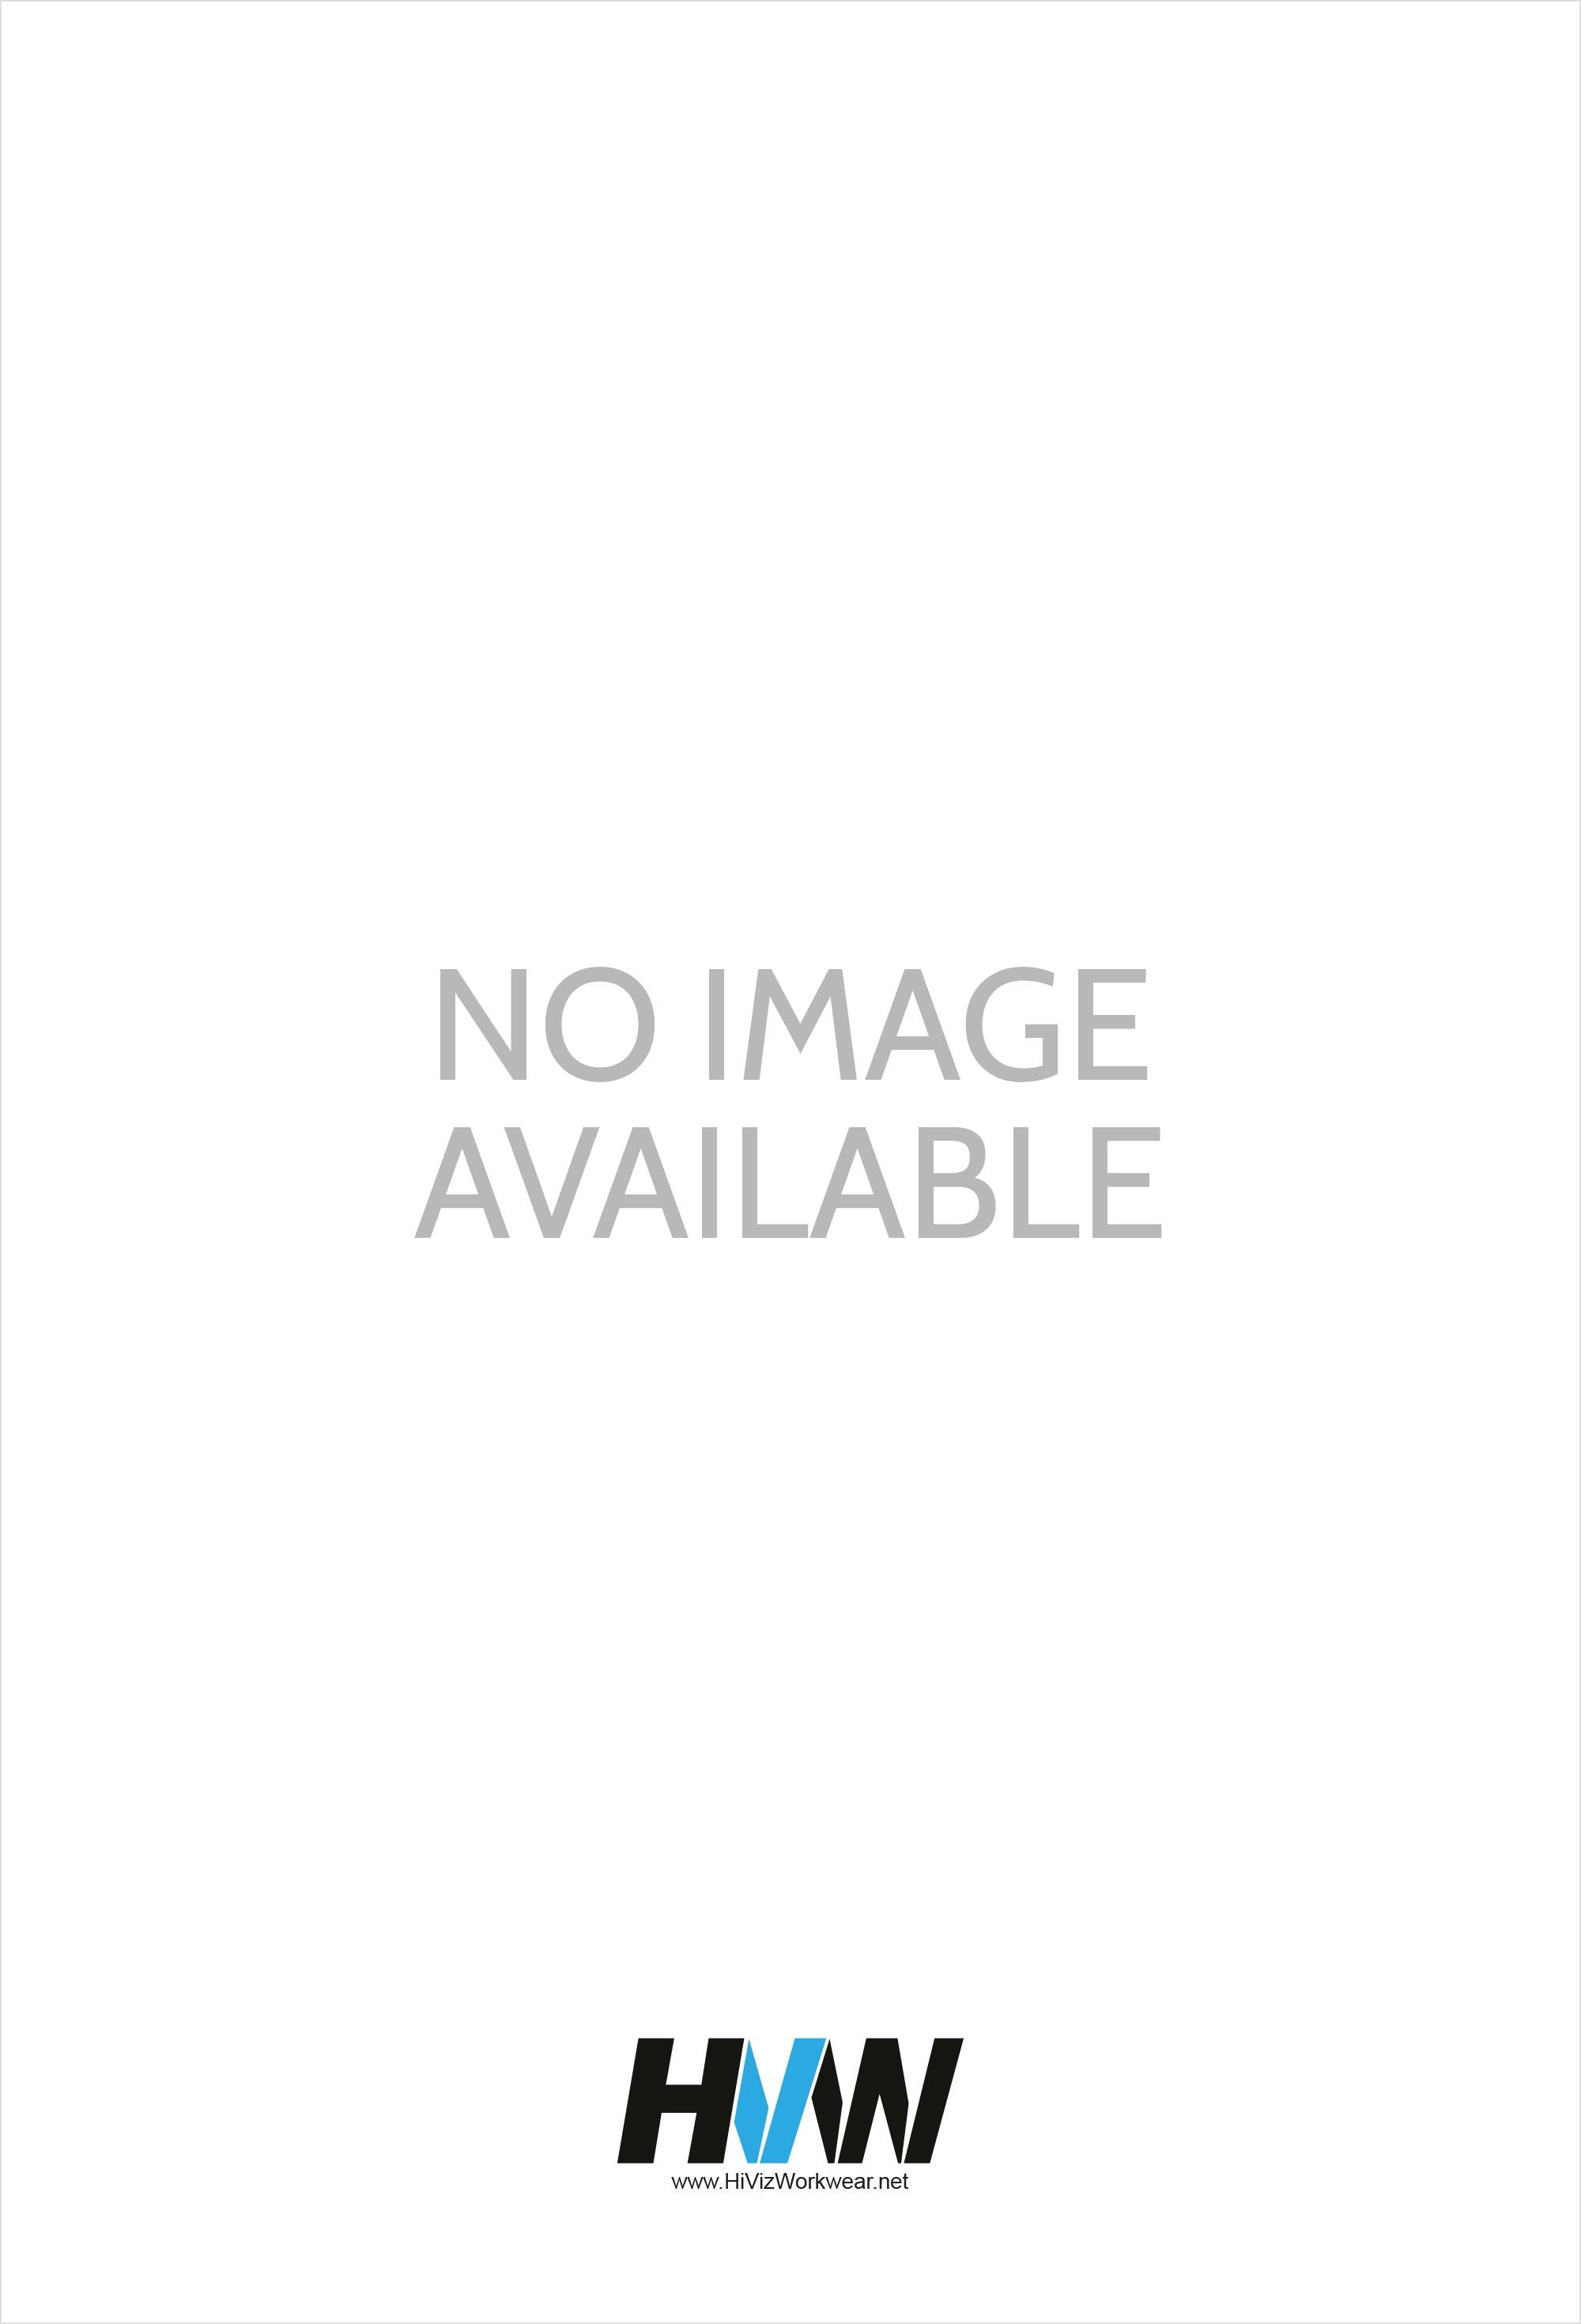 Premier PR202 Short SleevePoplin Shirt  (Collar Size 14.5 To 19.0)